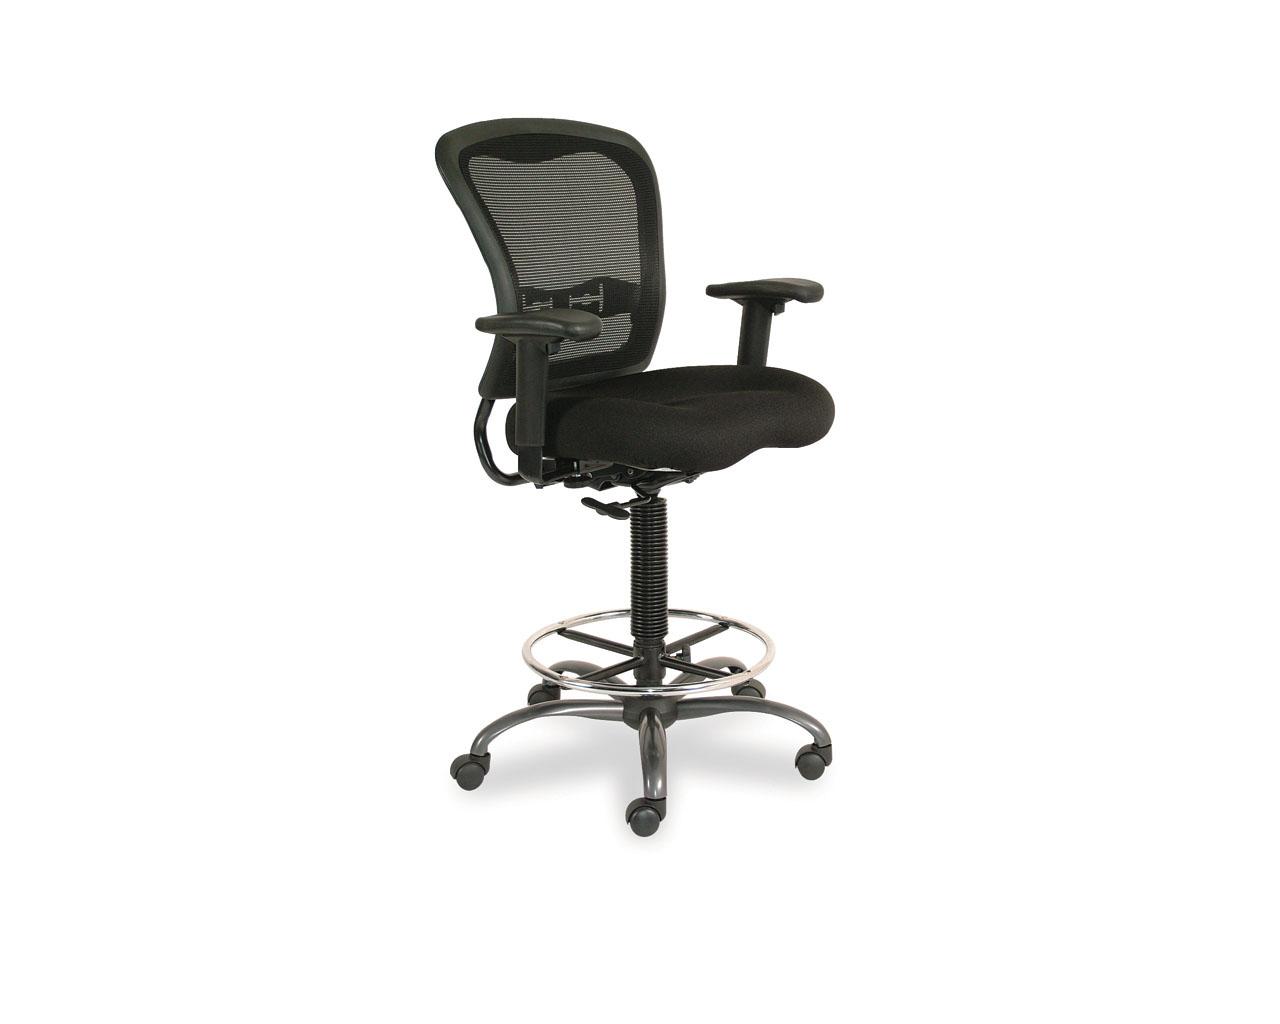 office chair kelowna wayfair dining chairs perch